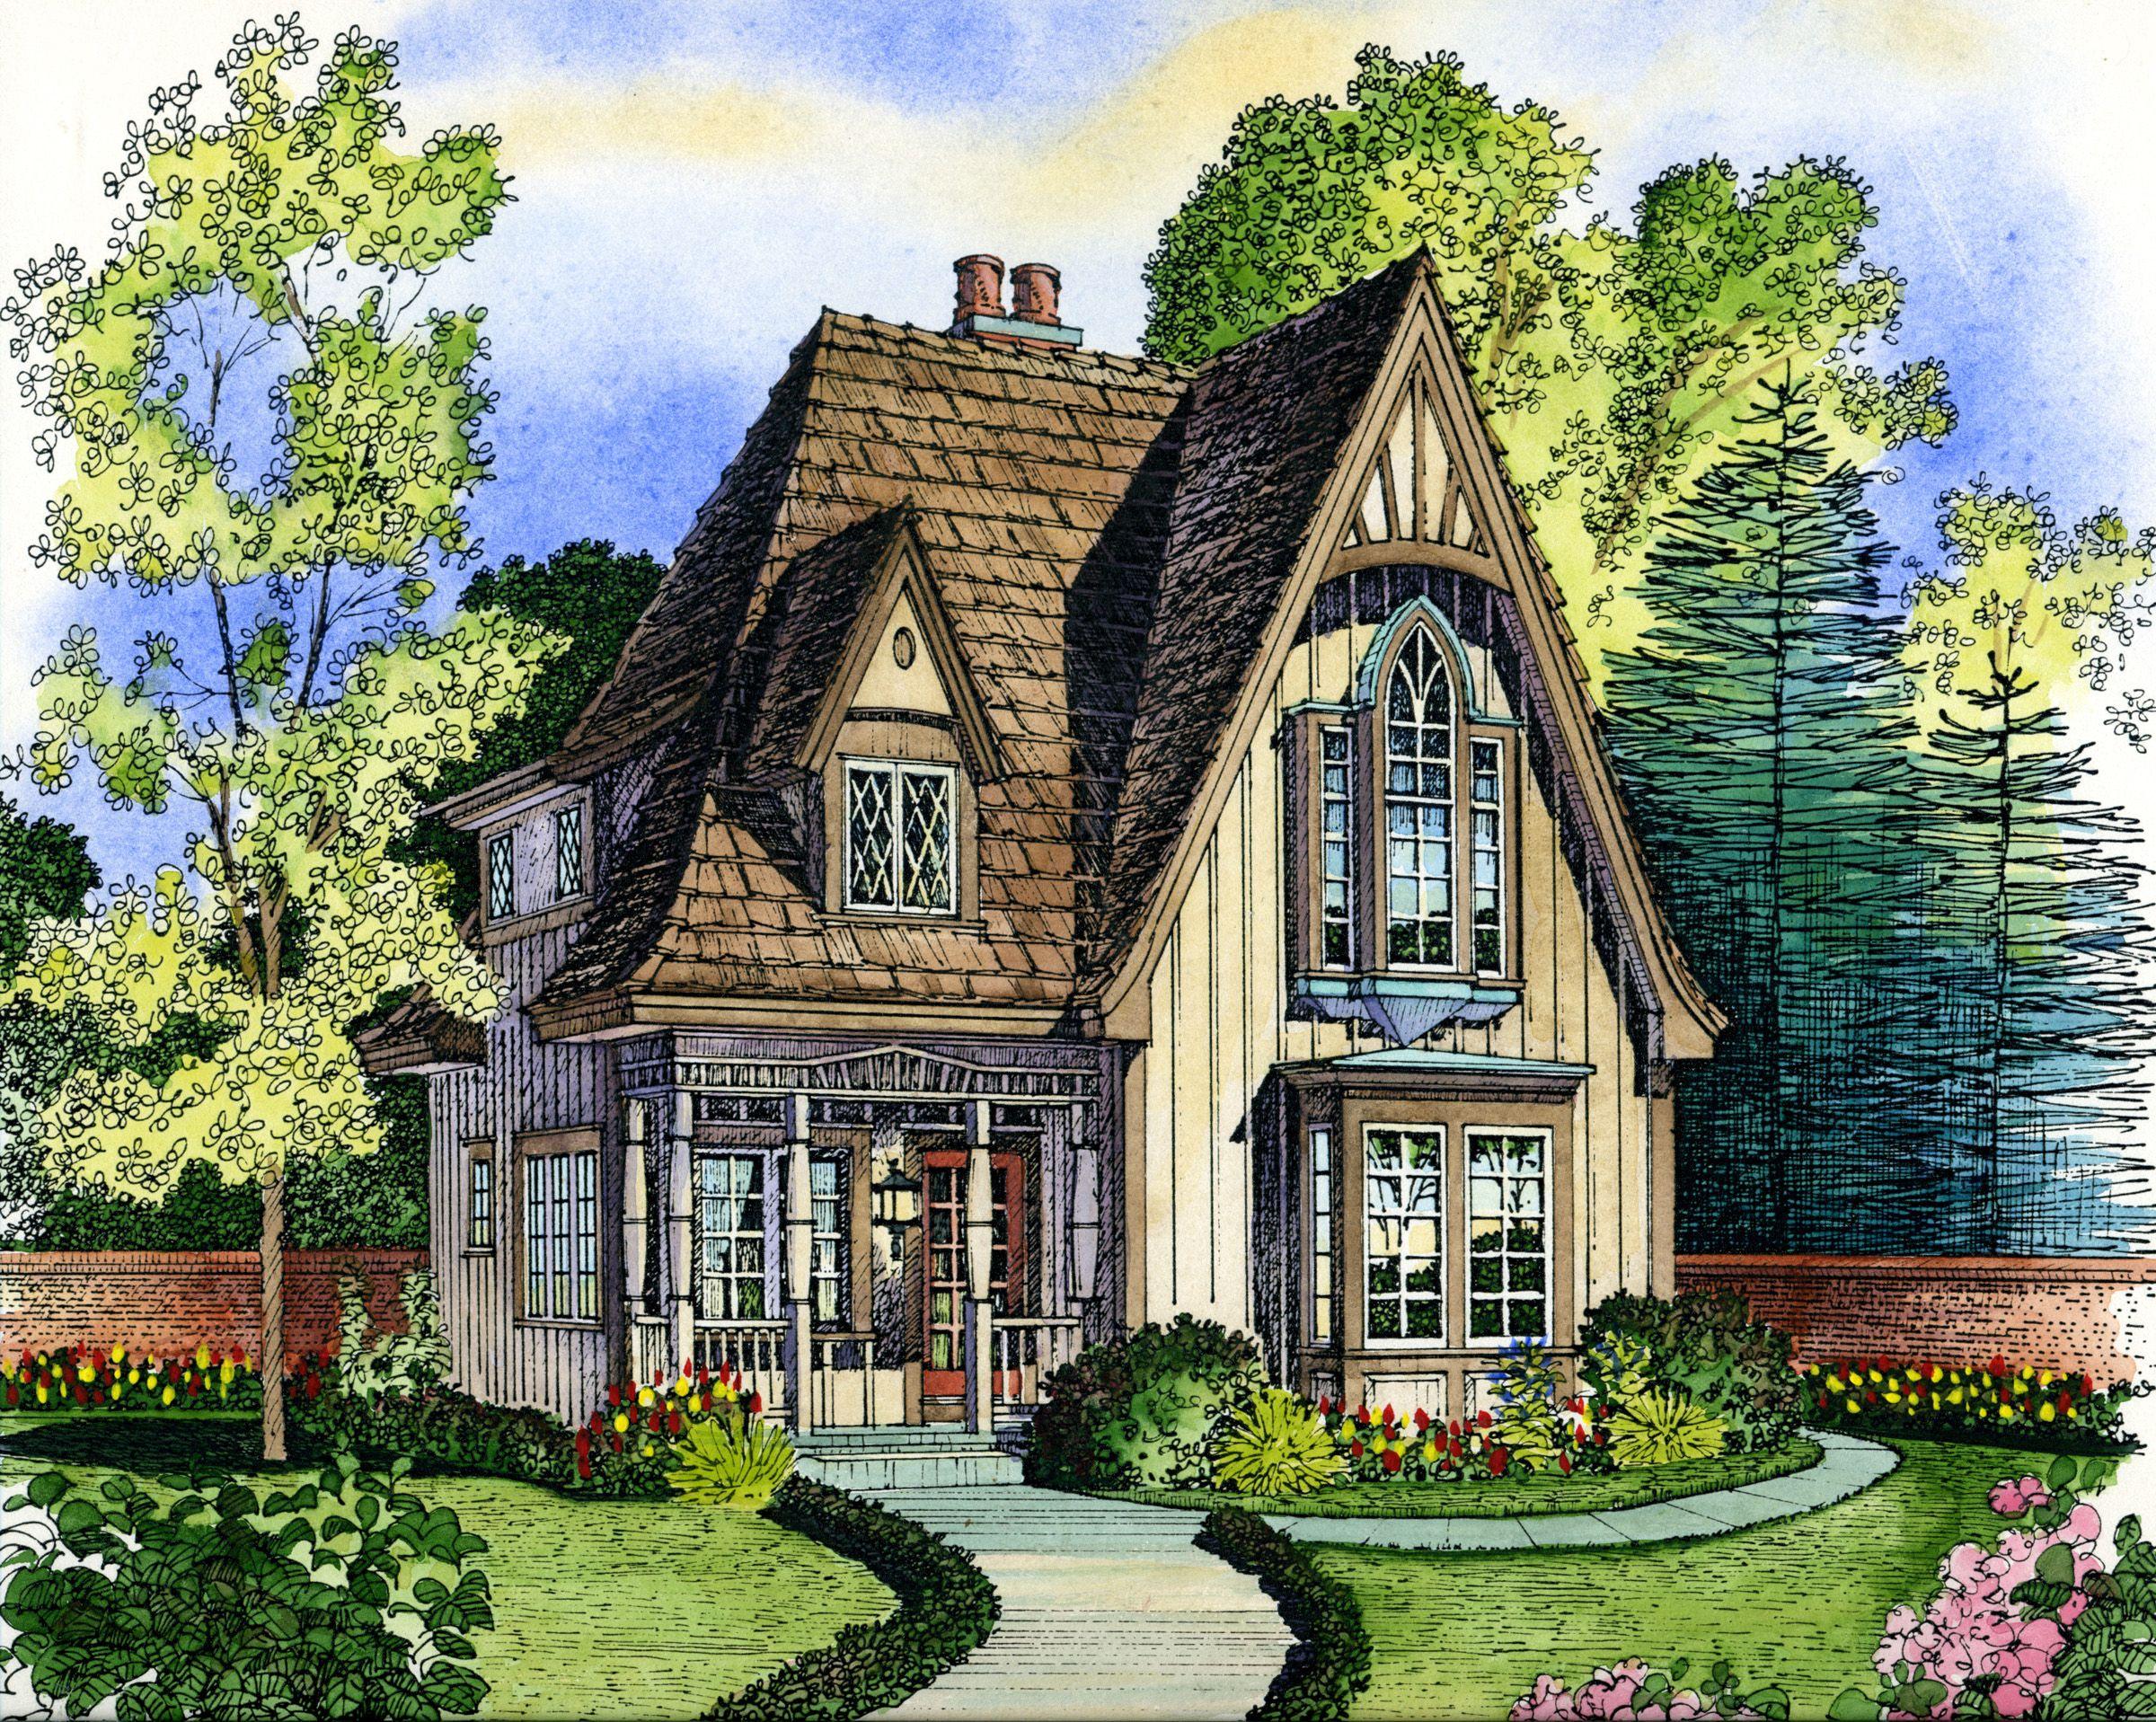 English Stone Cottage House Plans plan 43000pf: adorable cottage | gotico, ciondoli e cottage